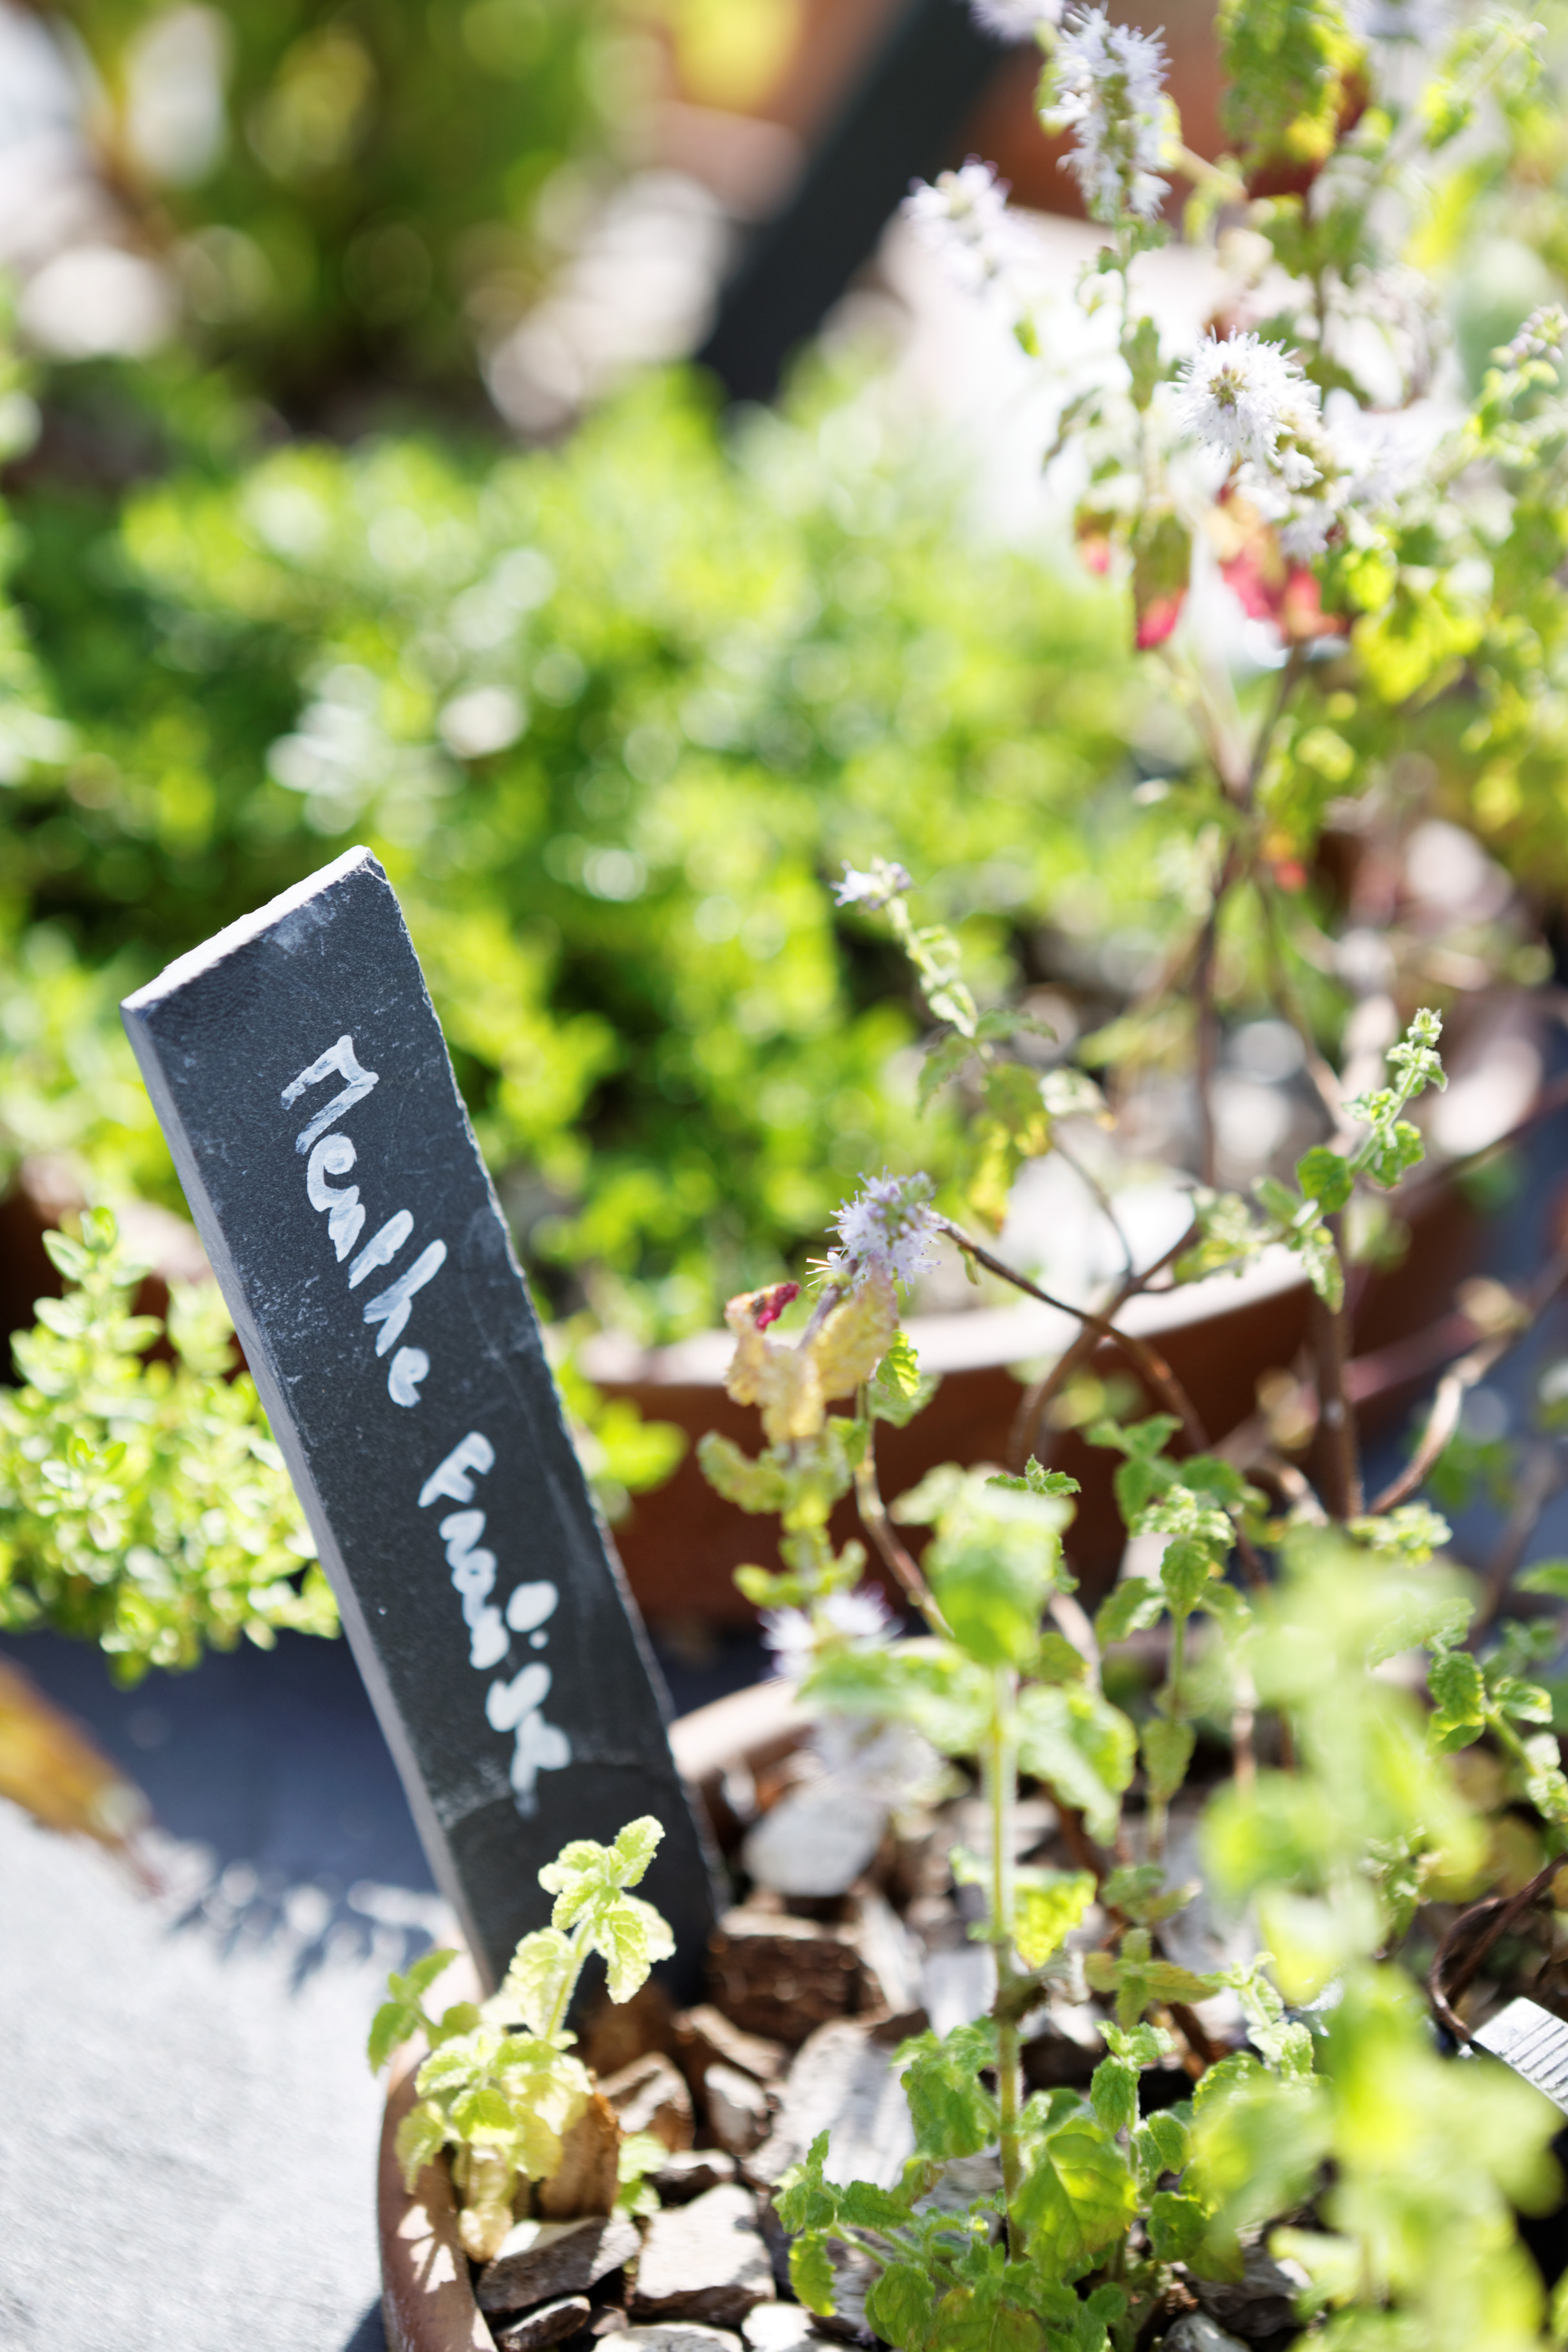 hotel_mandarin_oriental_paris_terraces_gardens_vegetable_garden_thierry_marx_christophe_gautrand_landscape_outdoor_designer_4.jpg